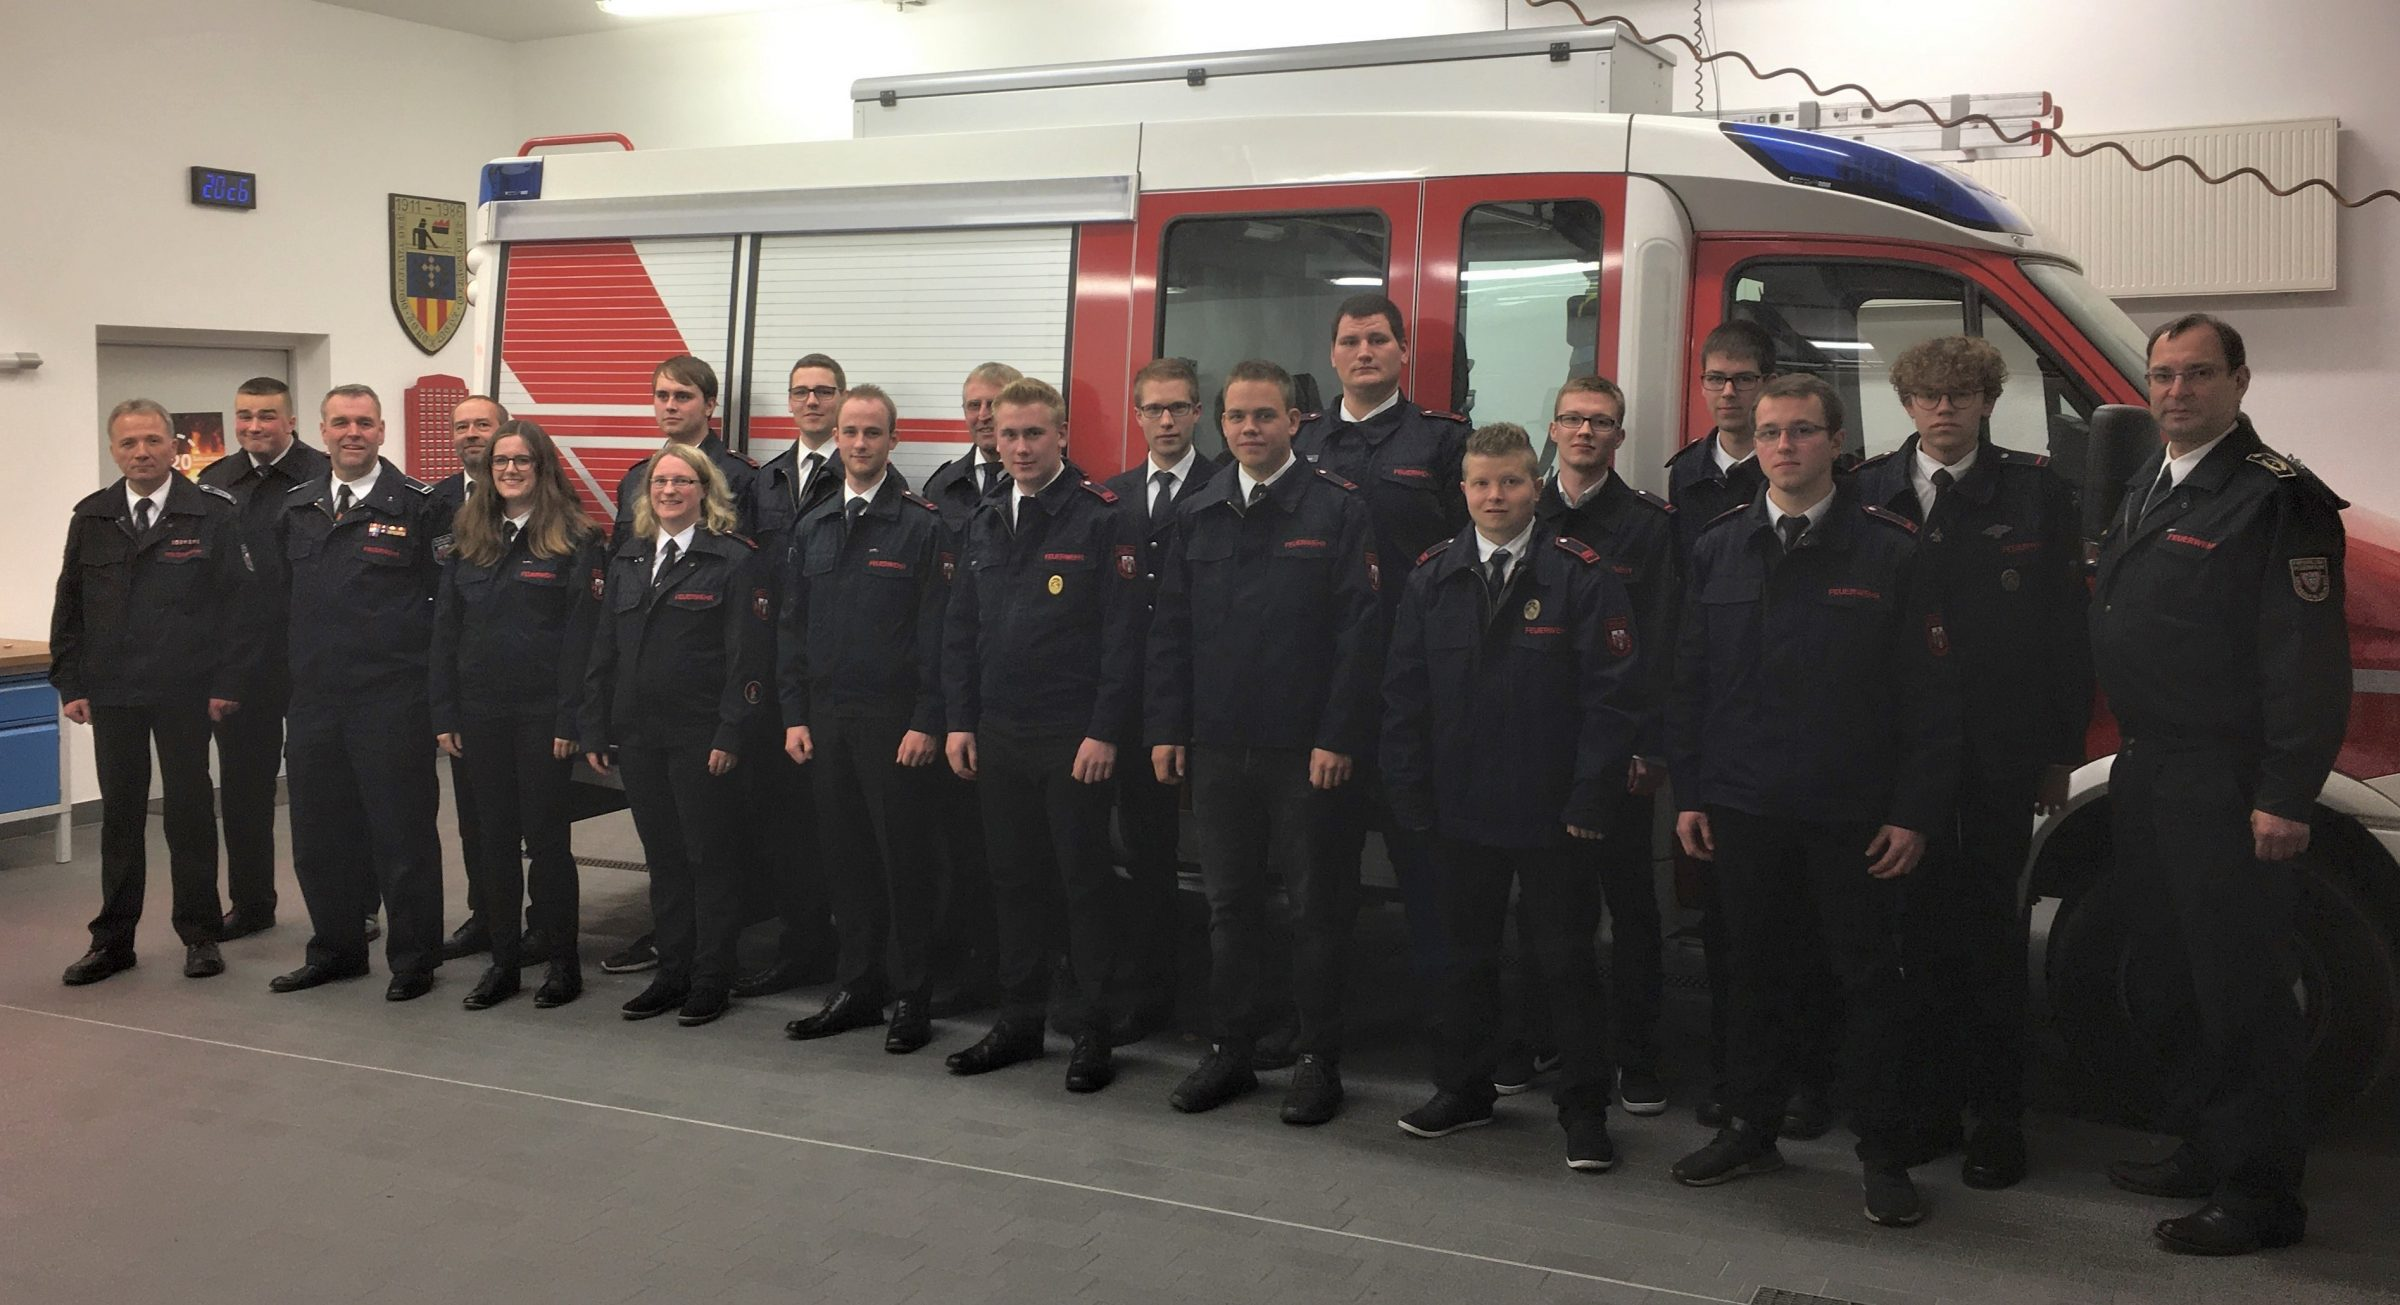 Sprechfunkerlehrgang II/2019 der Freiwilligen Feuerwehr Stadt Schmallenberg in Grafschaft